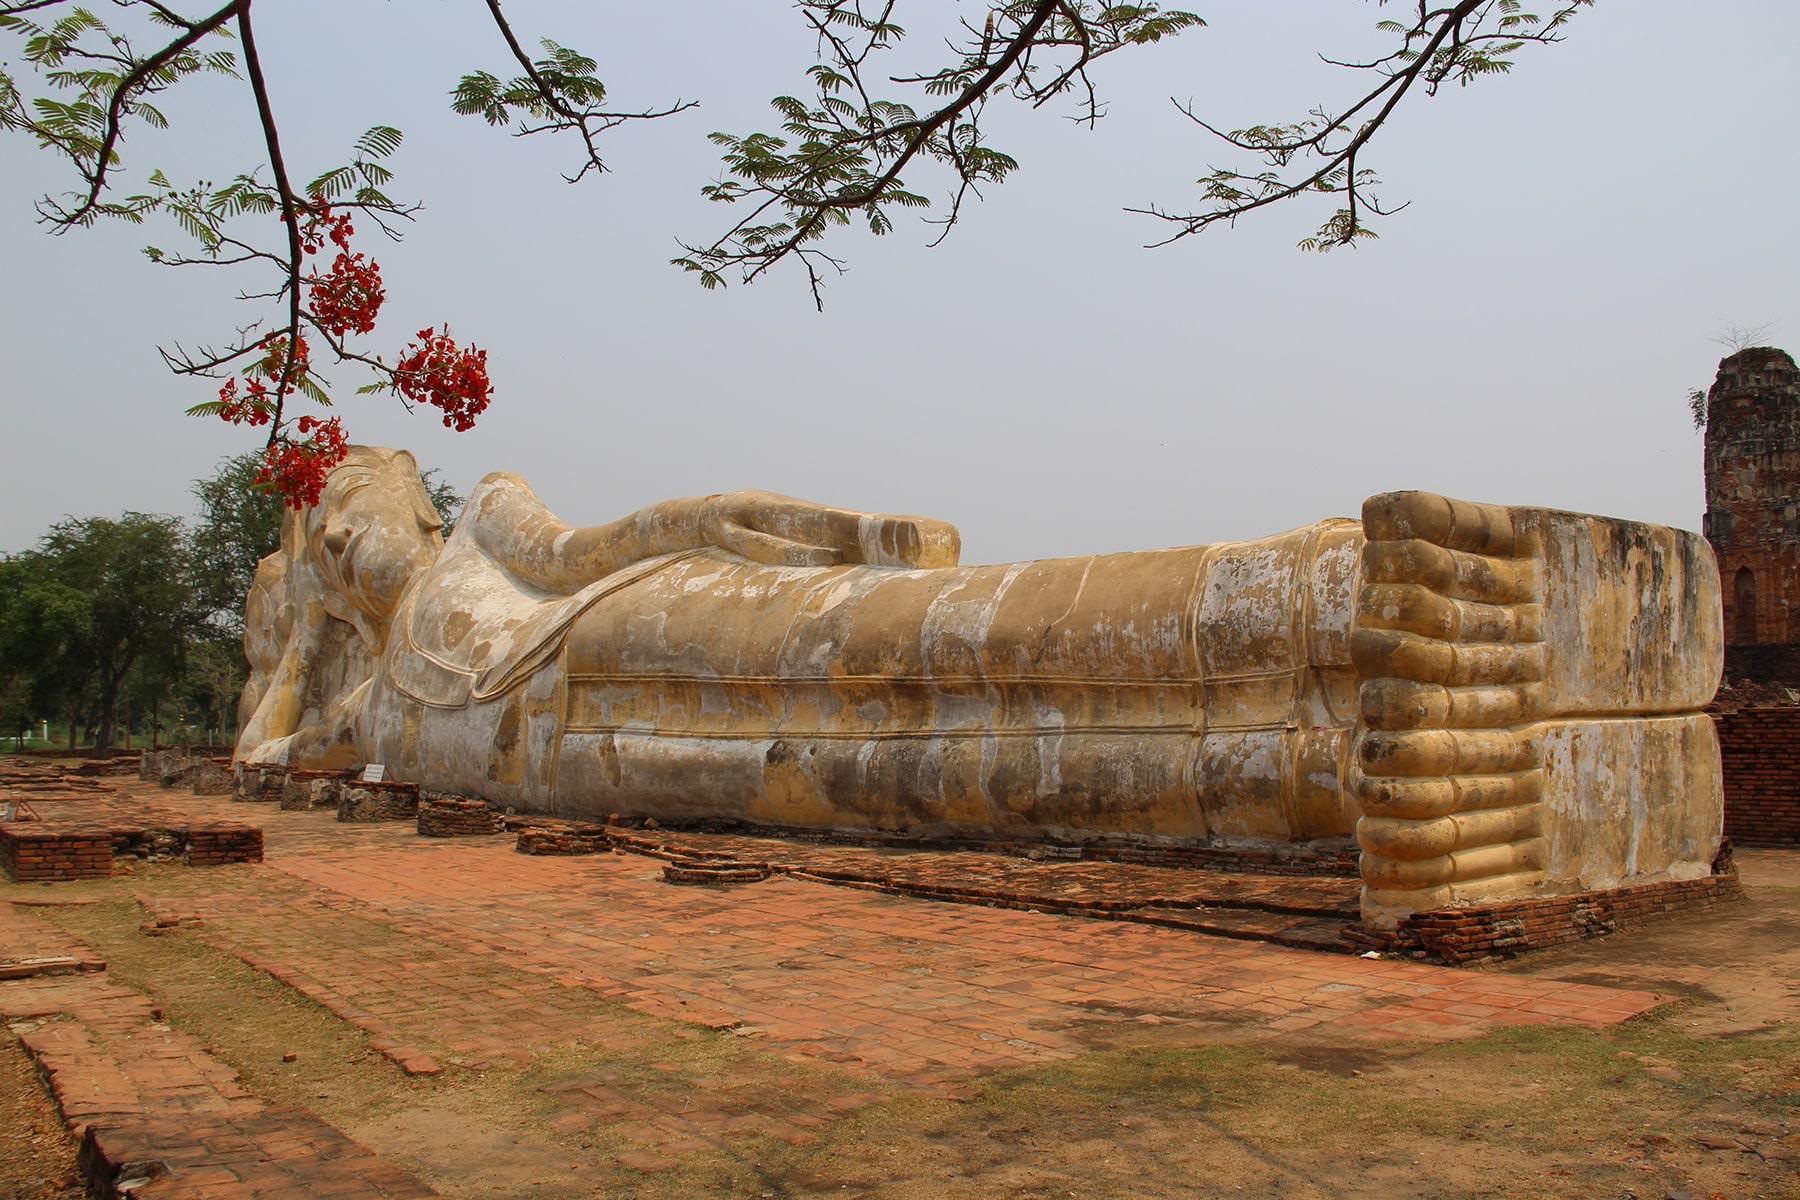 Bouddha couché du temple Wat Lokayasutharam d'Ayutthaya